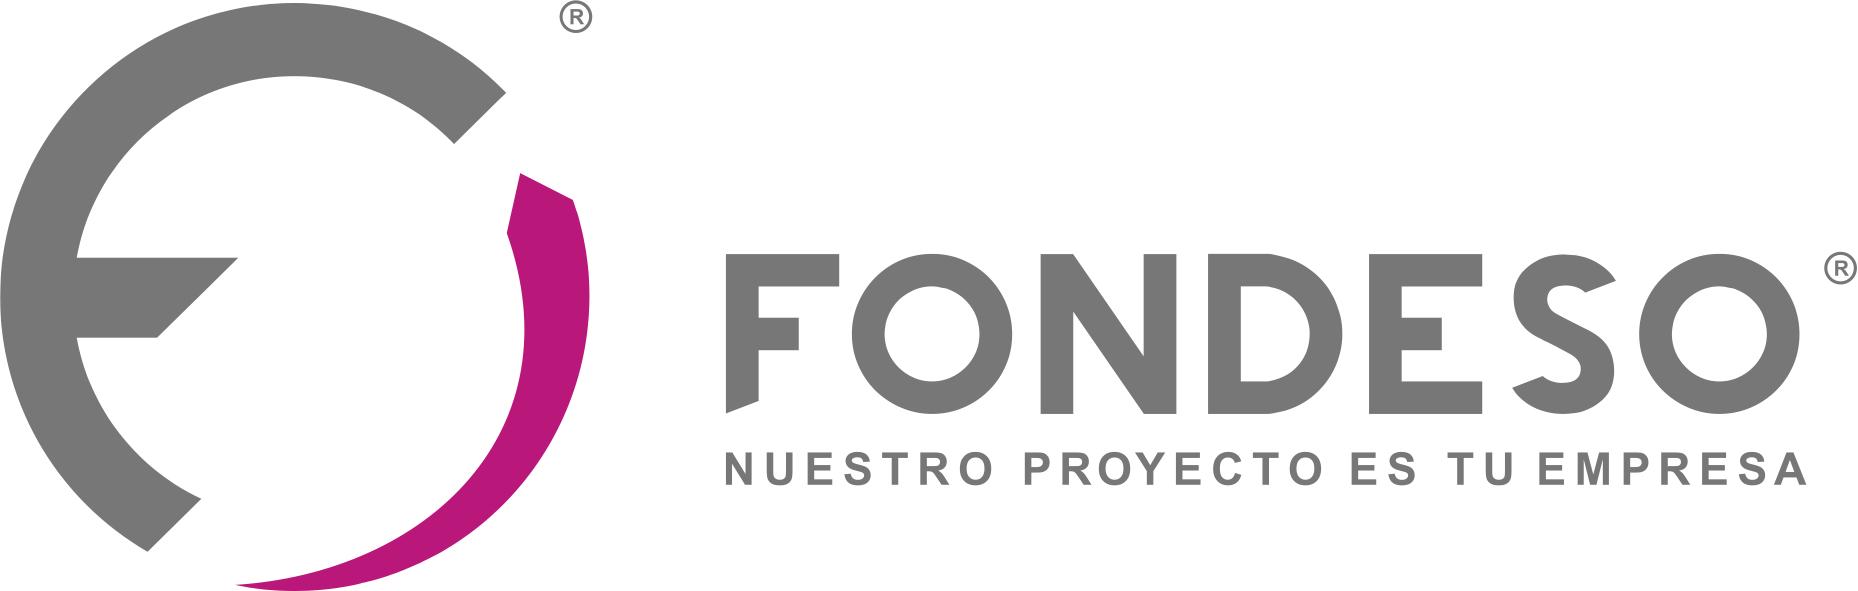 www.fondeso.cdmx.gob.mx